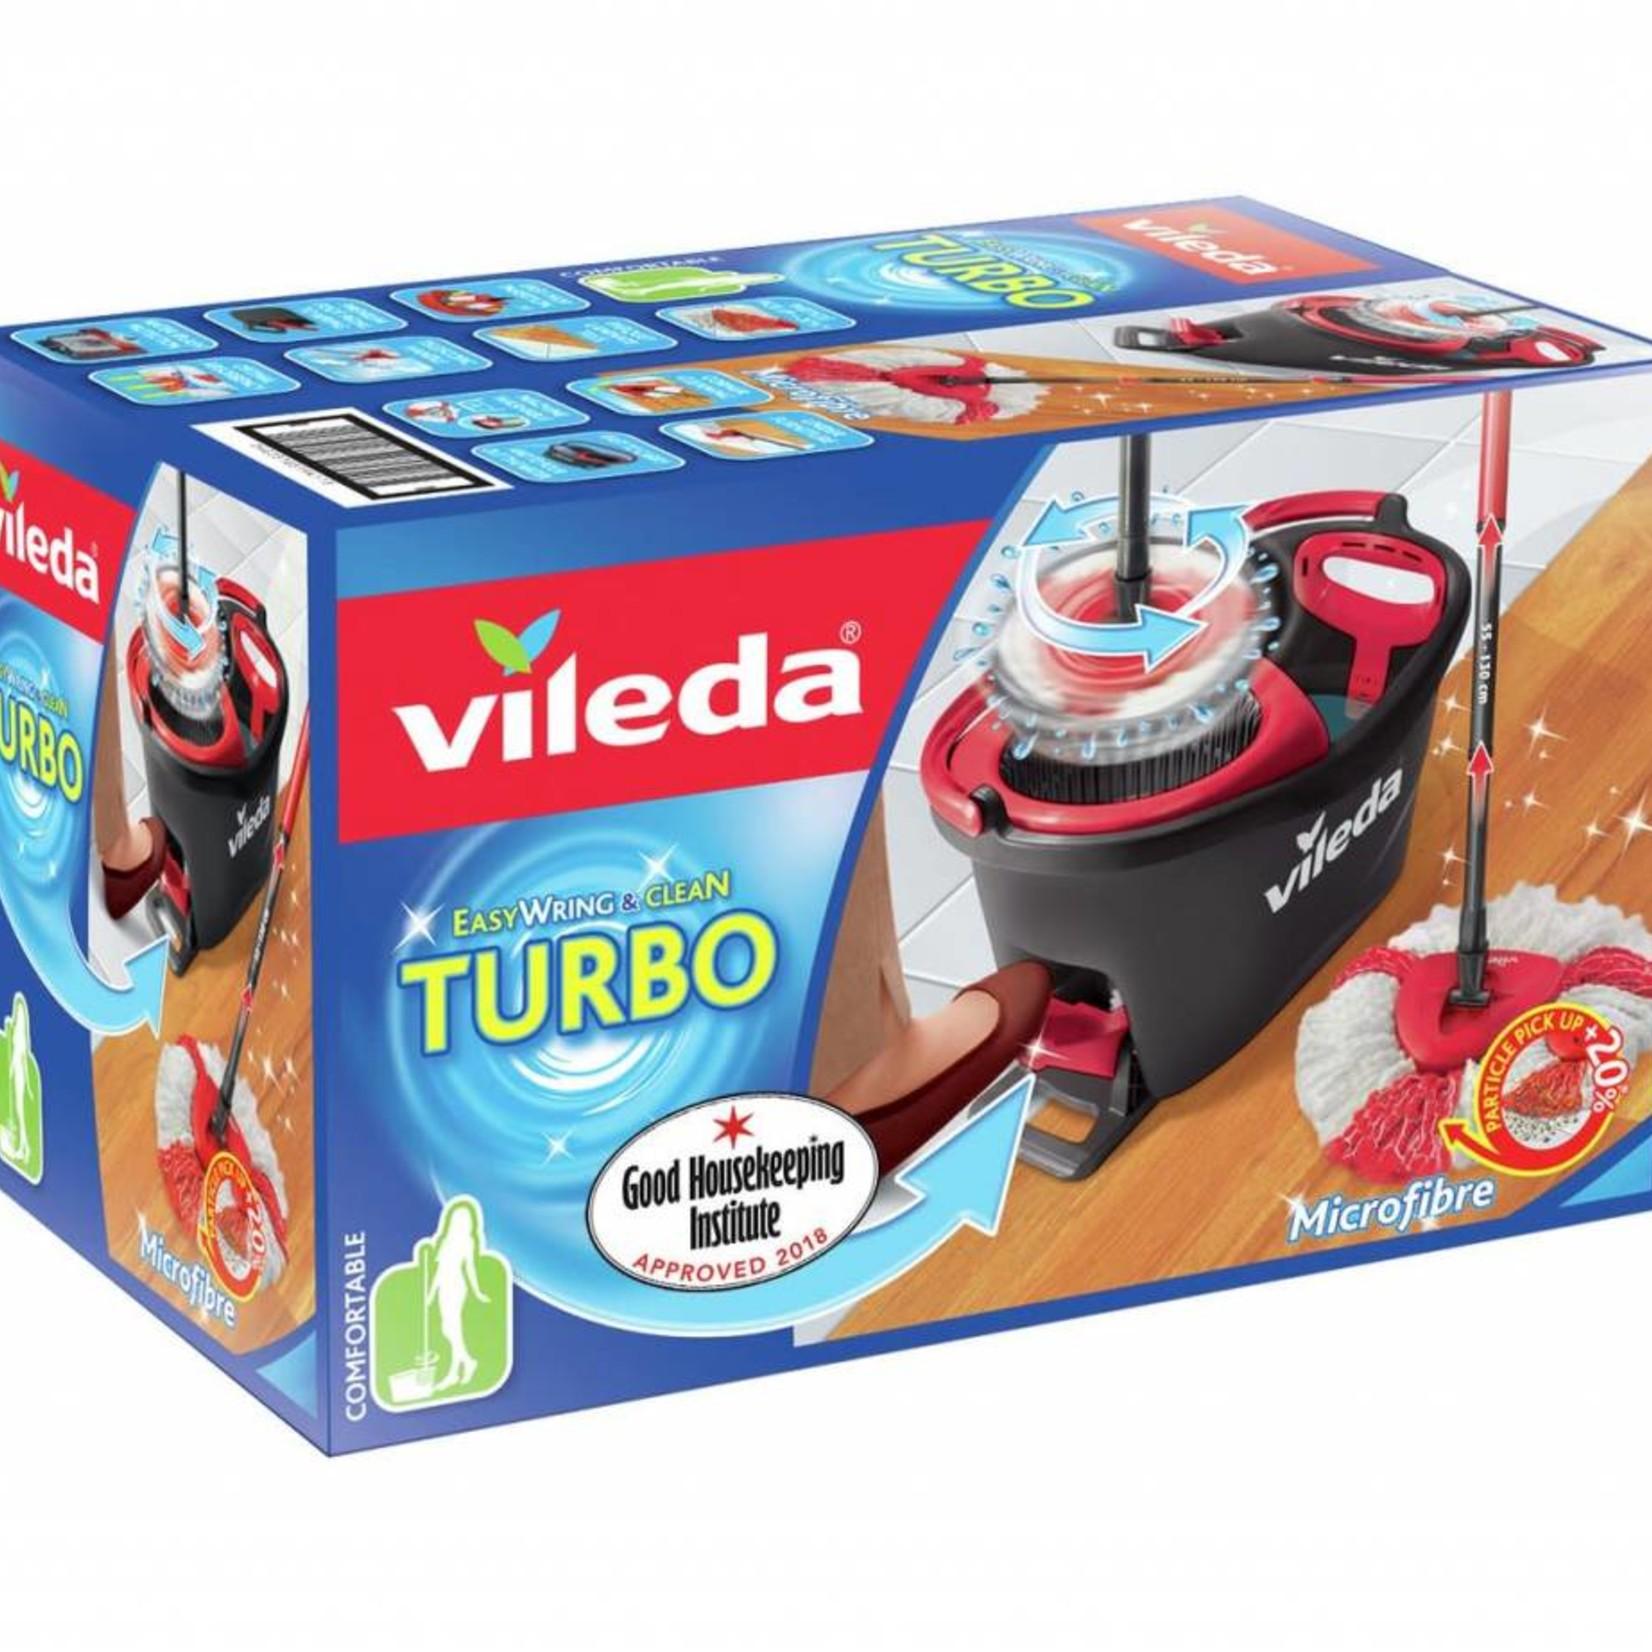 Vileda VILEDA TURBO MICROFIBRE SPINNING MOP SET